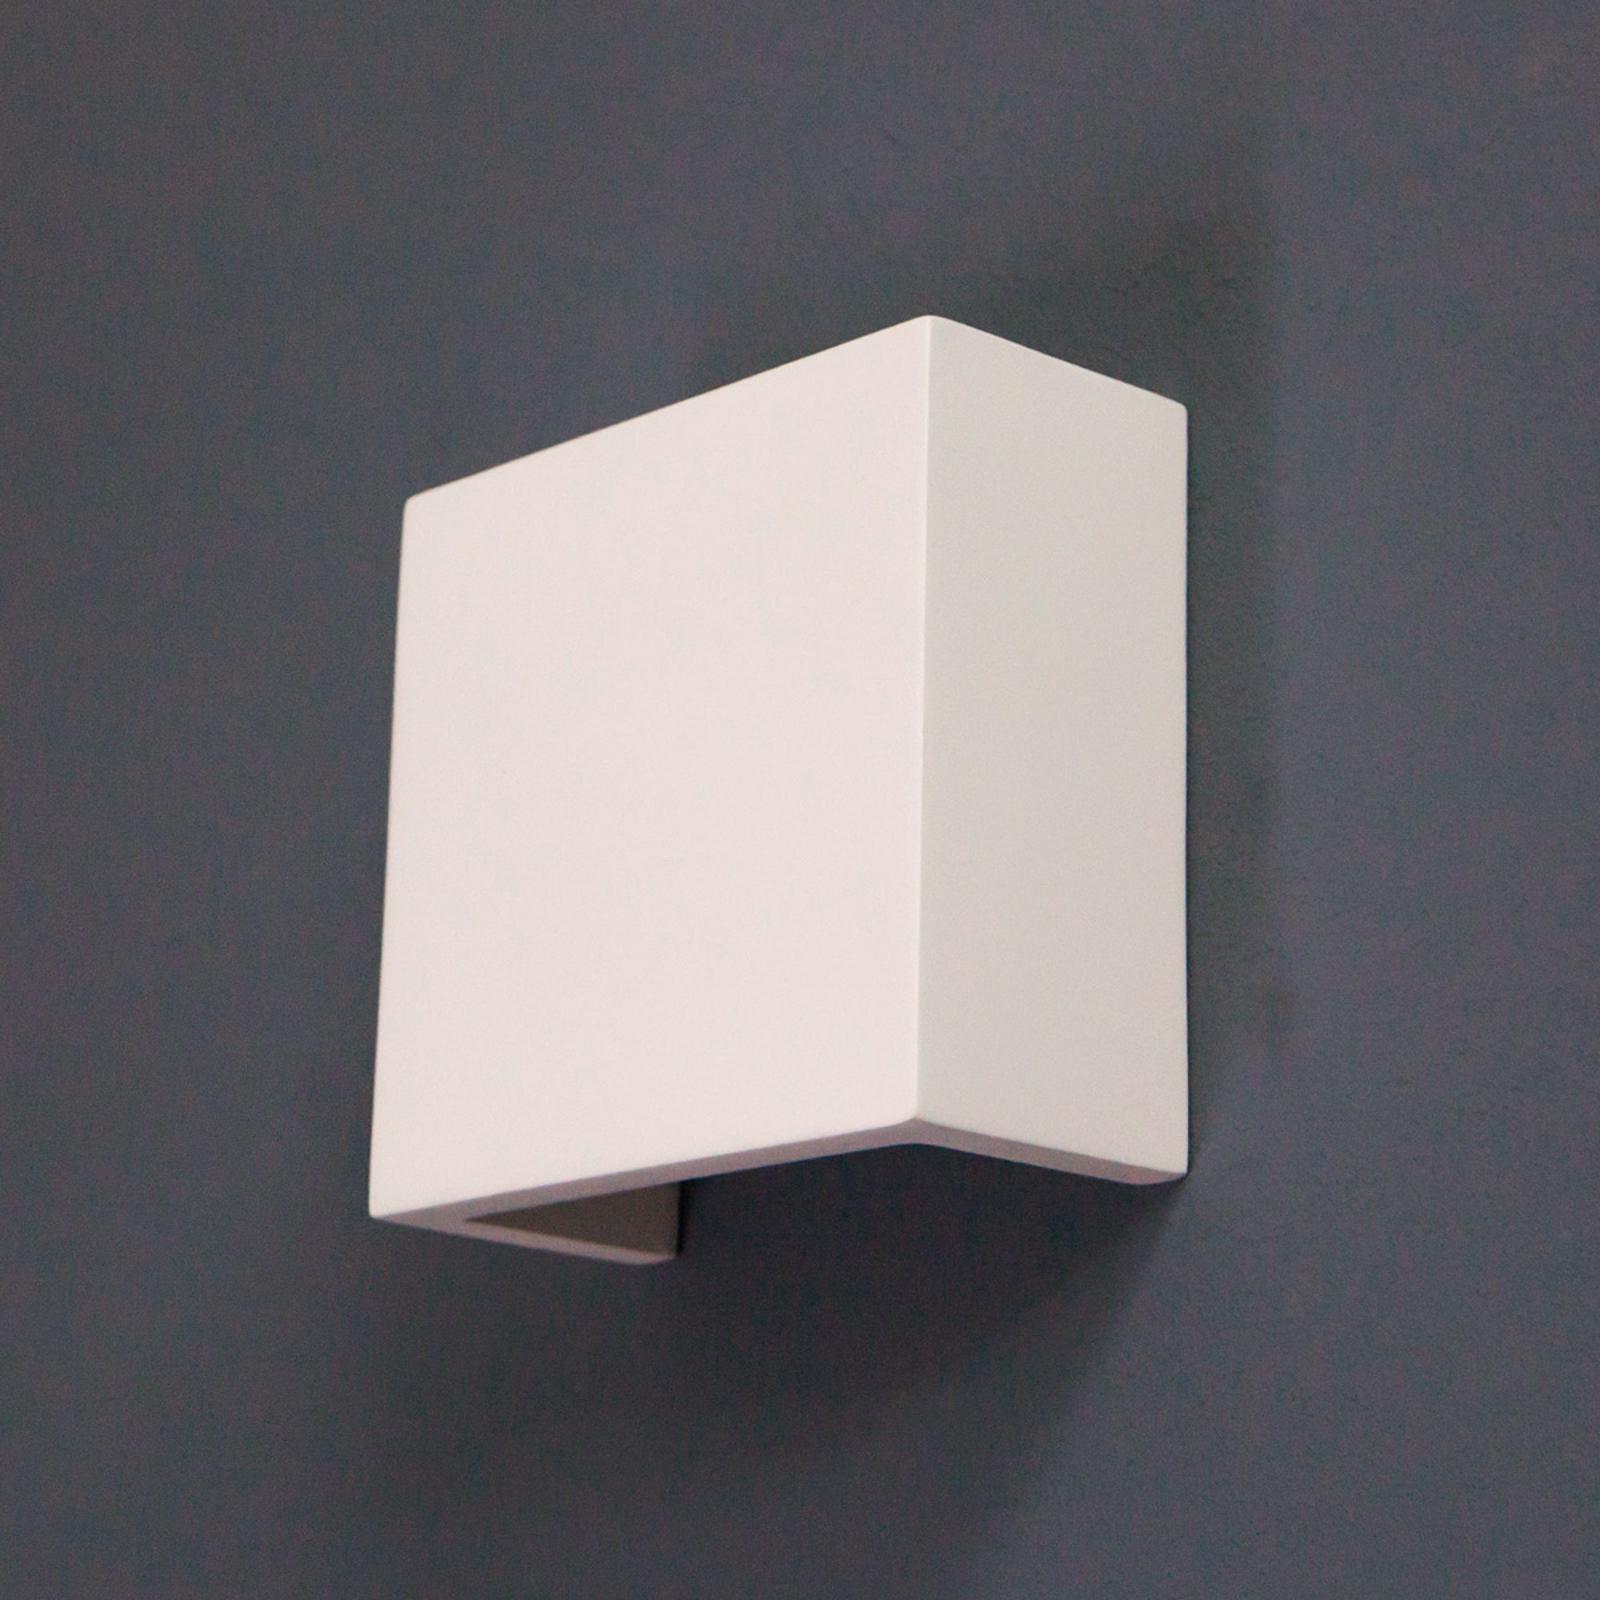 LED wandlamp Fabiola van gips, hoogte 12,5 cm